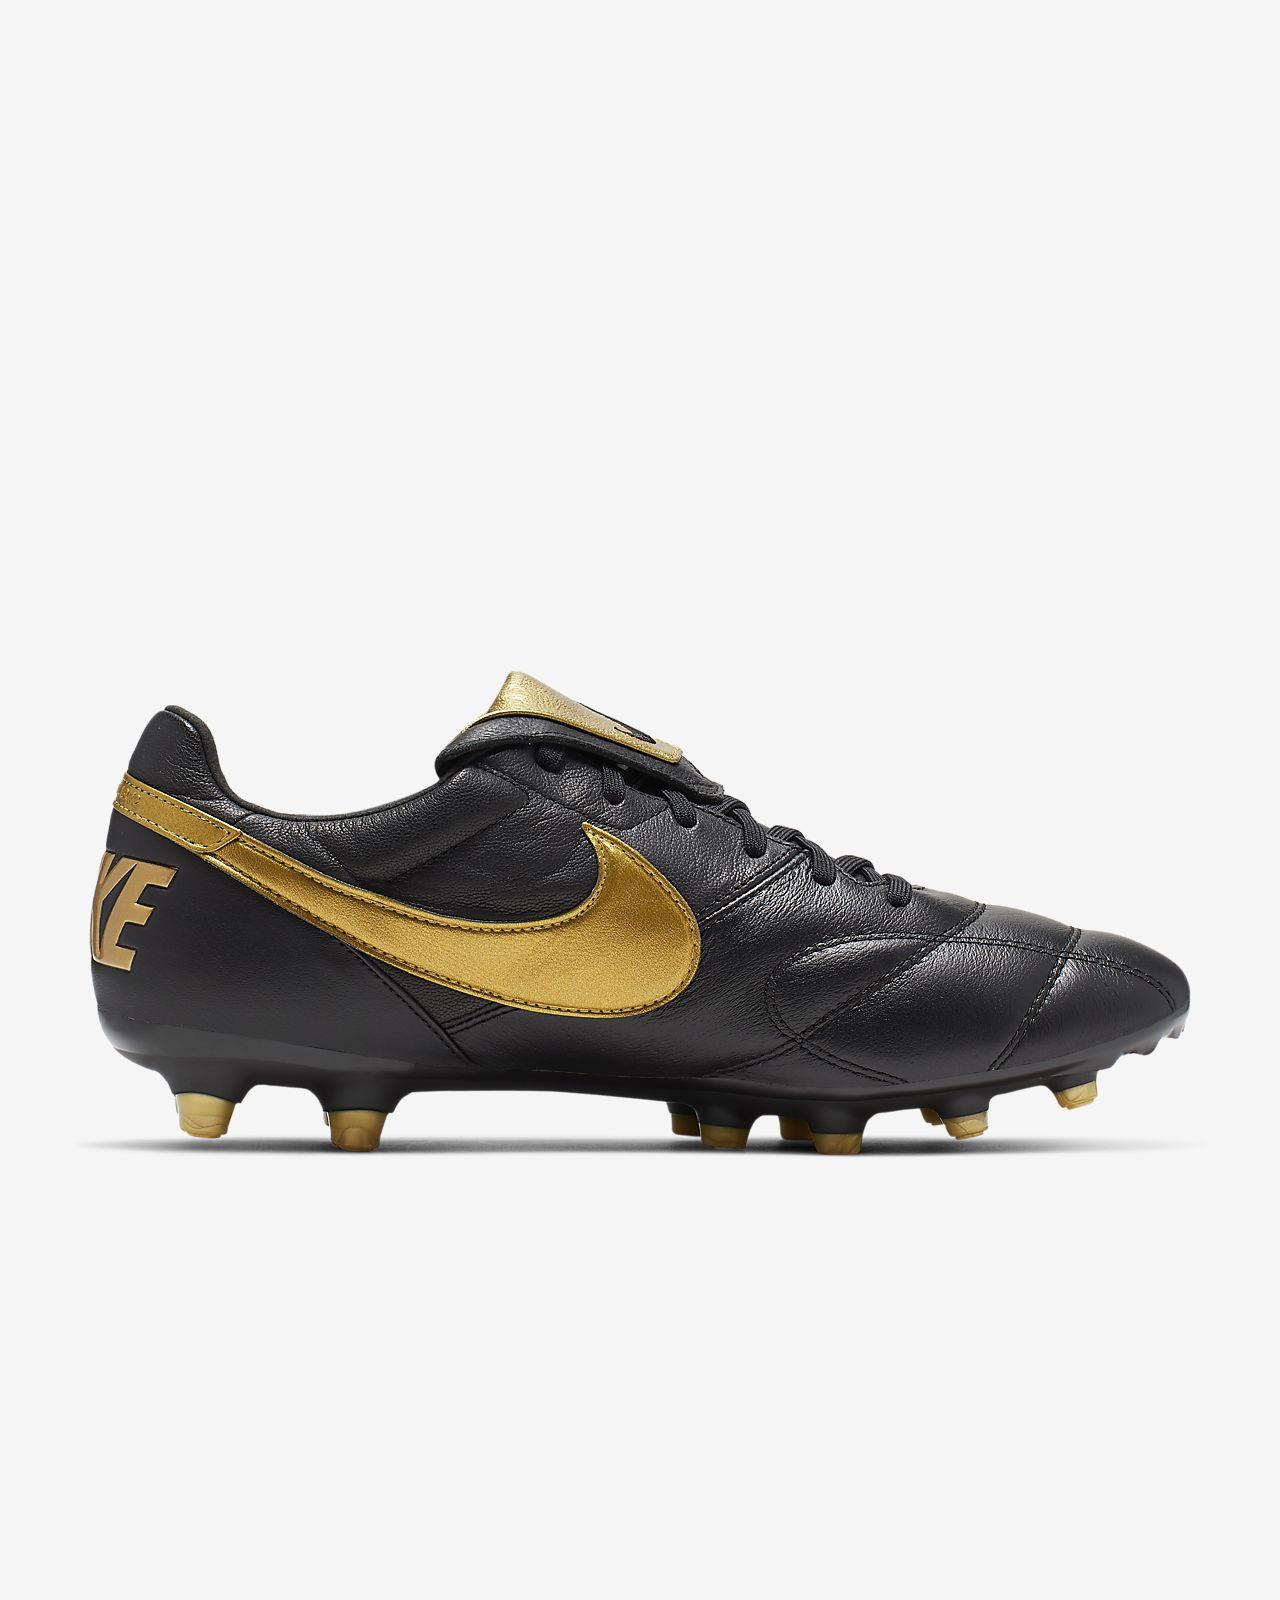 Sec Pour Chaussure Ii À Crampons De Nike Fg Football Premier Terrain q3ARL54j